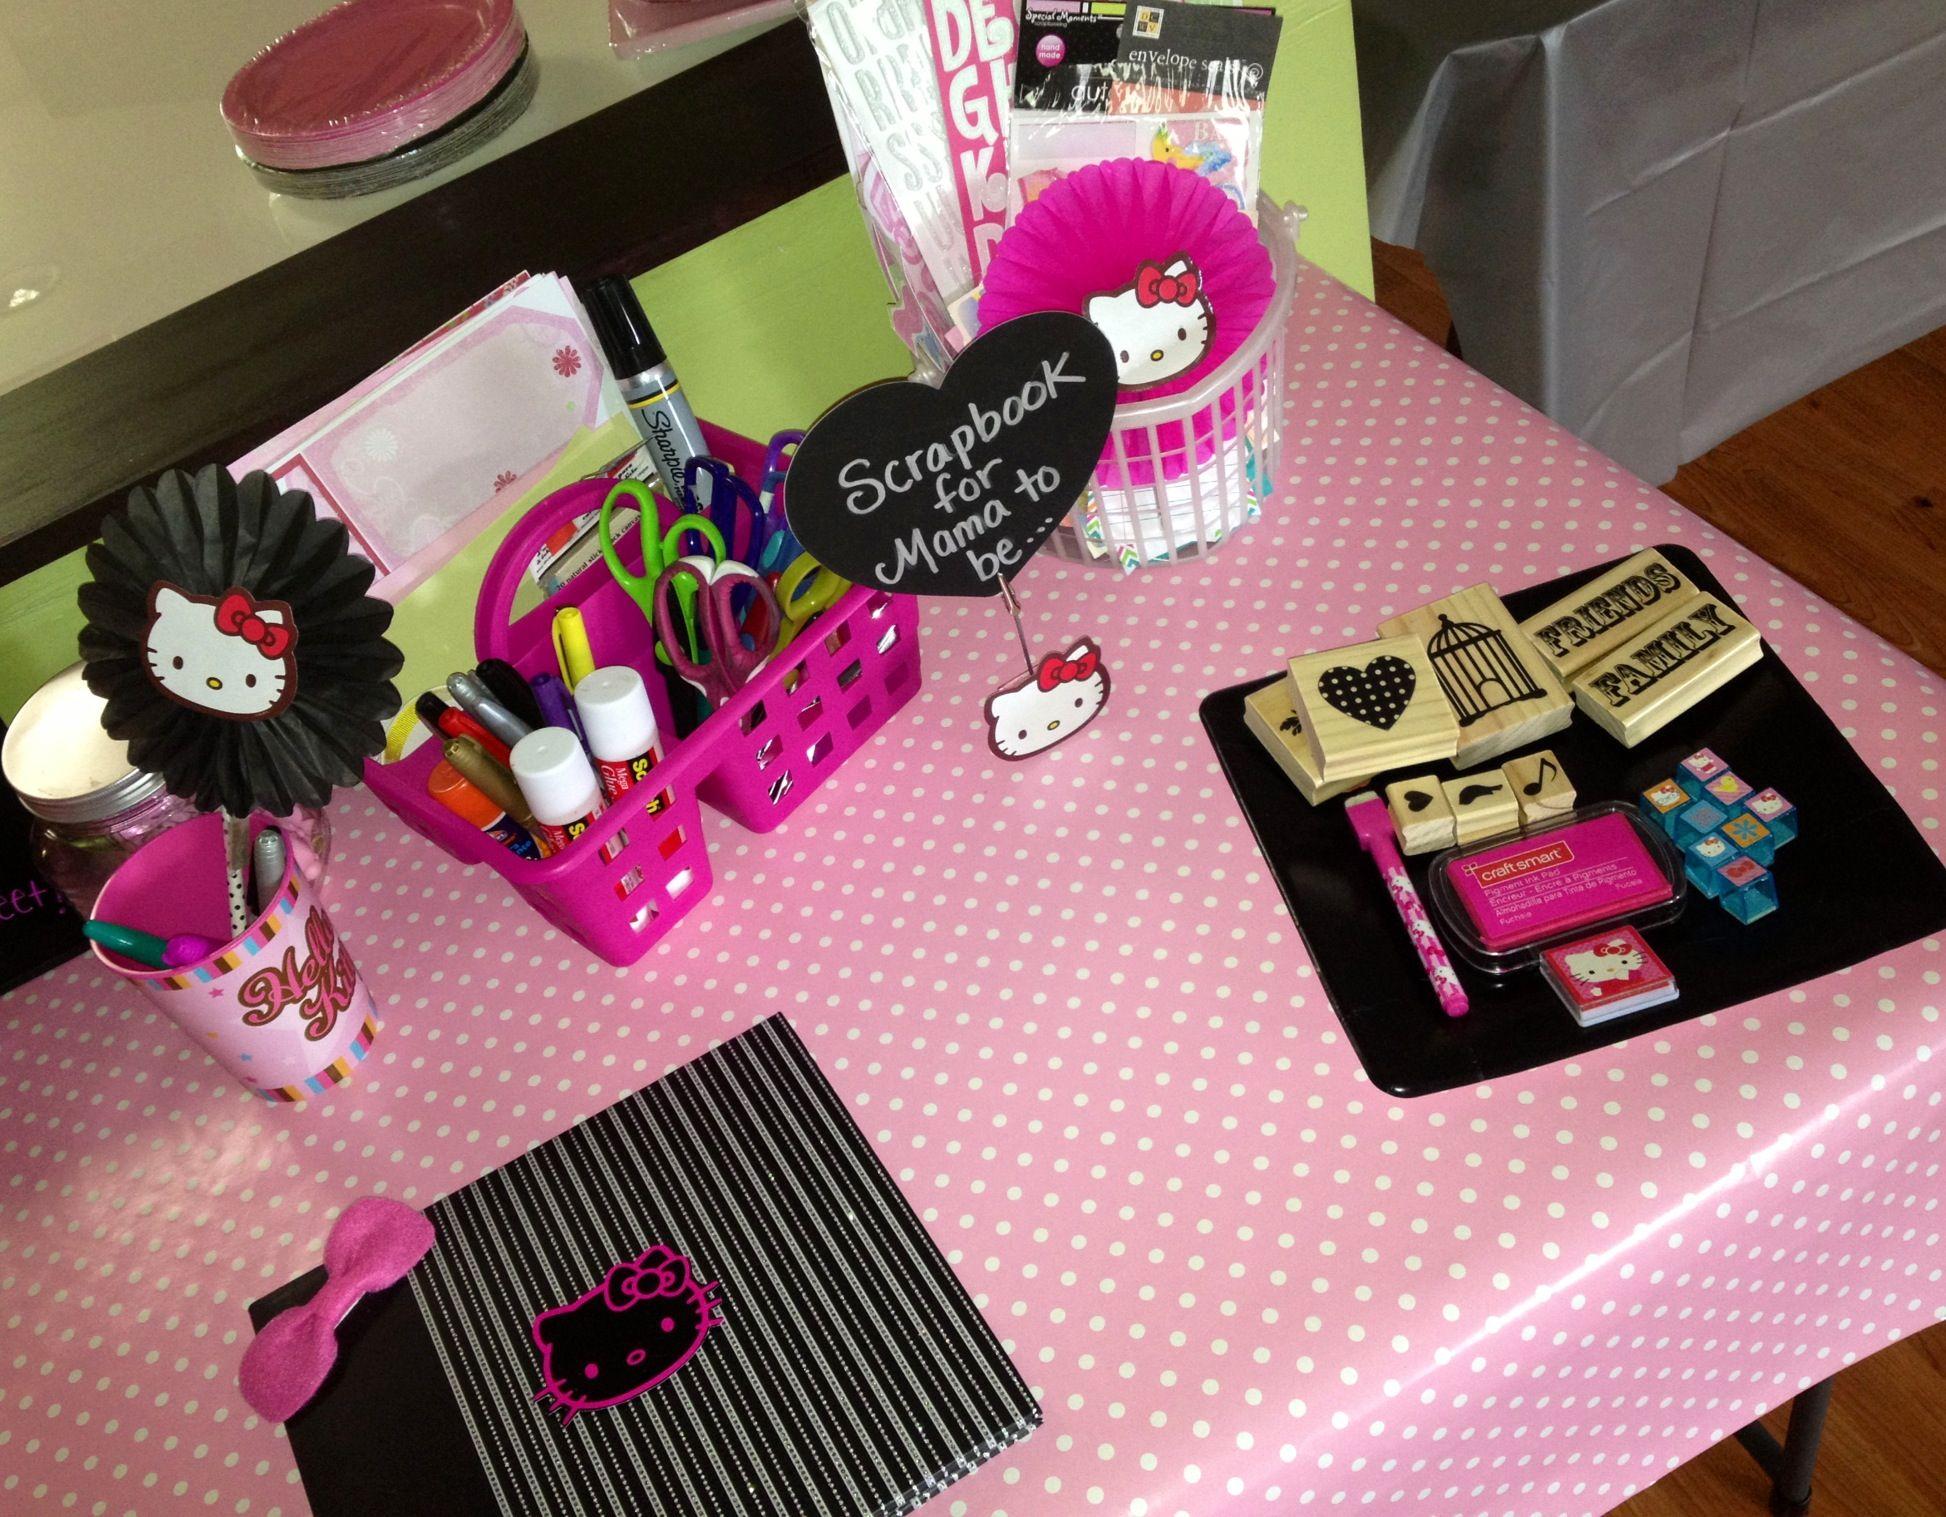 Scrapbook ideas hello kitty - Hello Kitty Baby Shower Activity Scrapbook Corner Make A Page To Put In Scrapbook